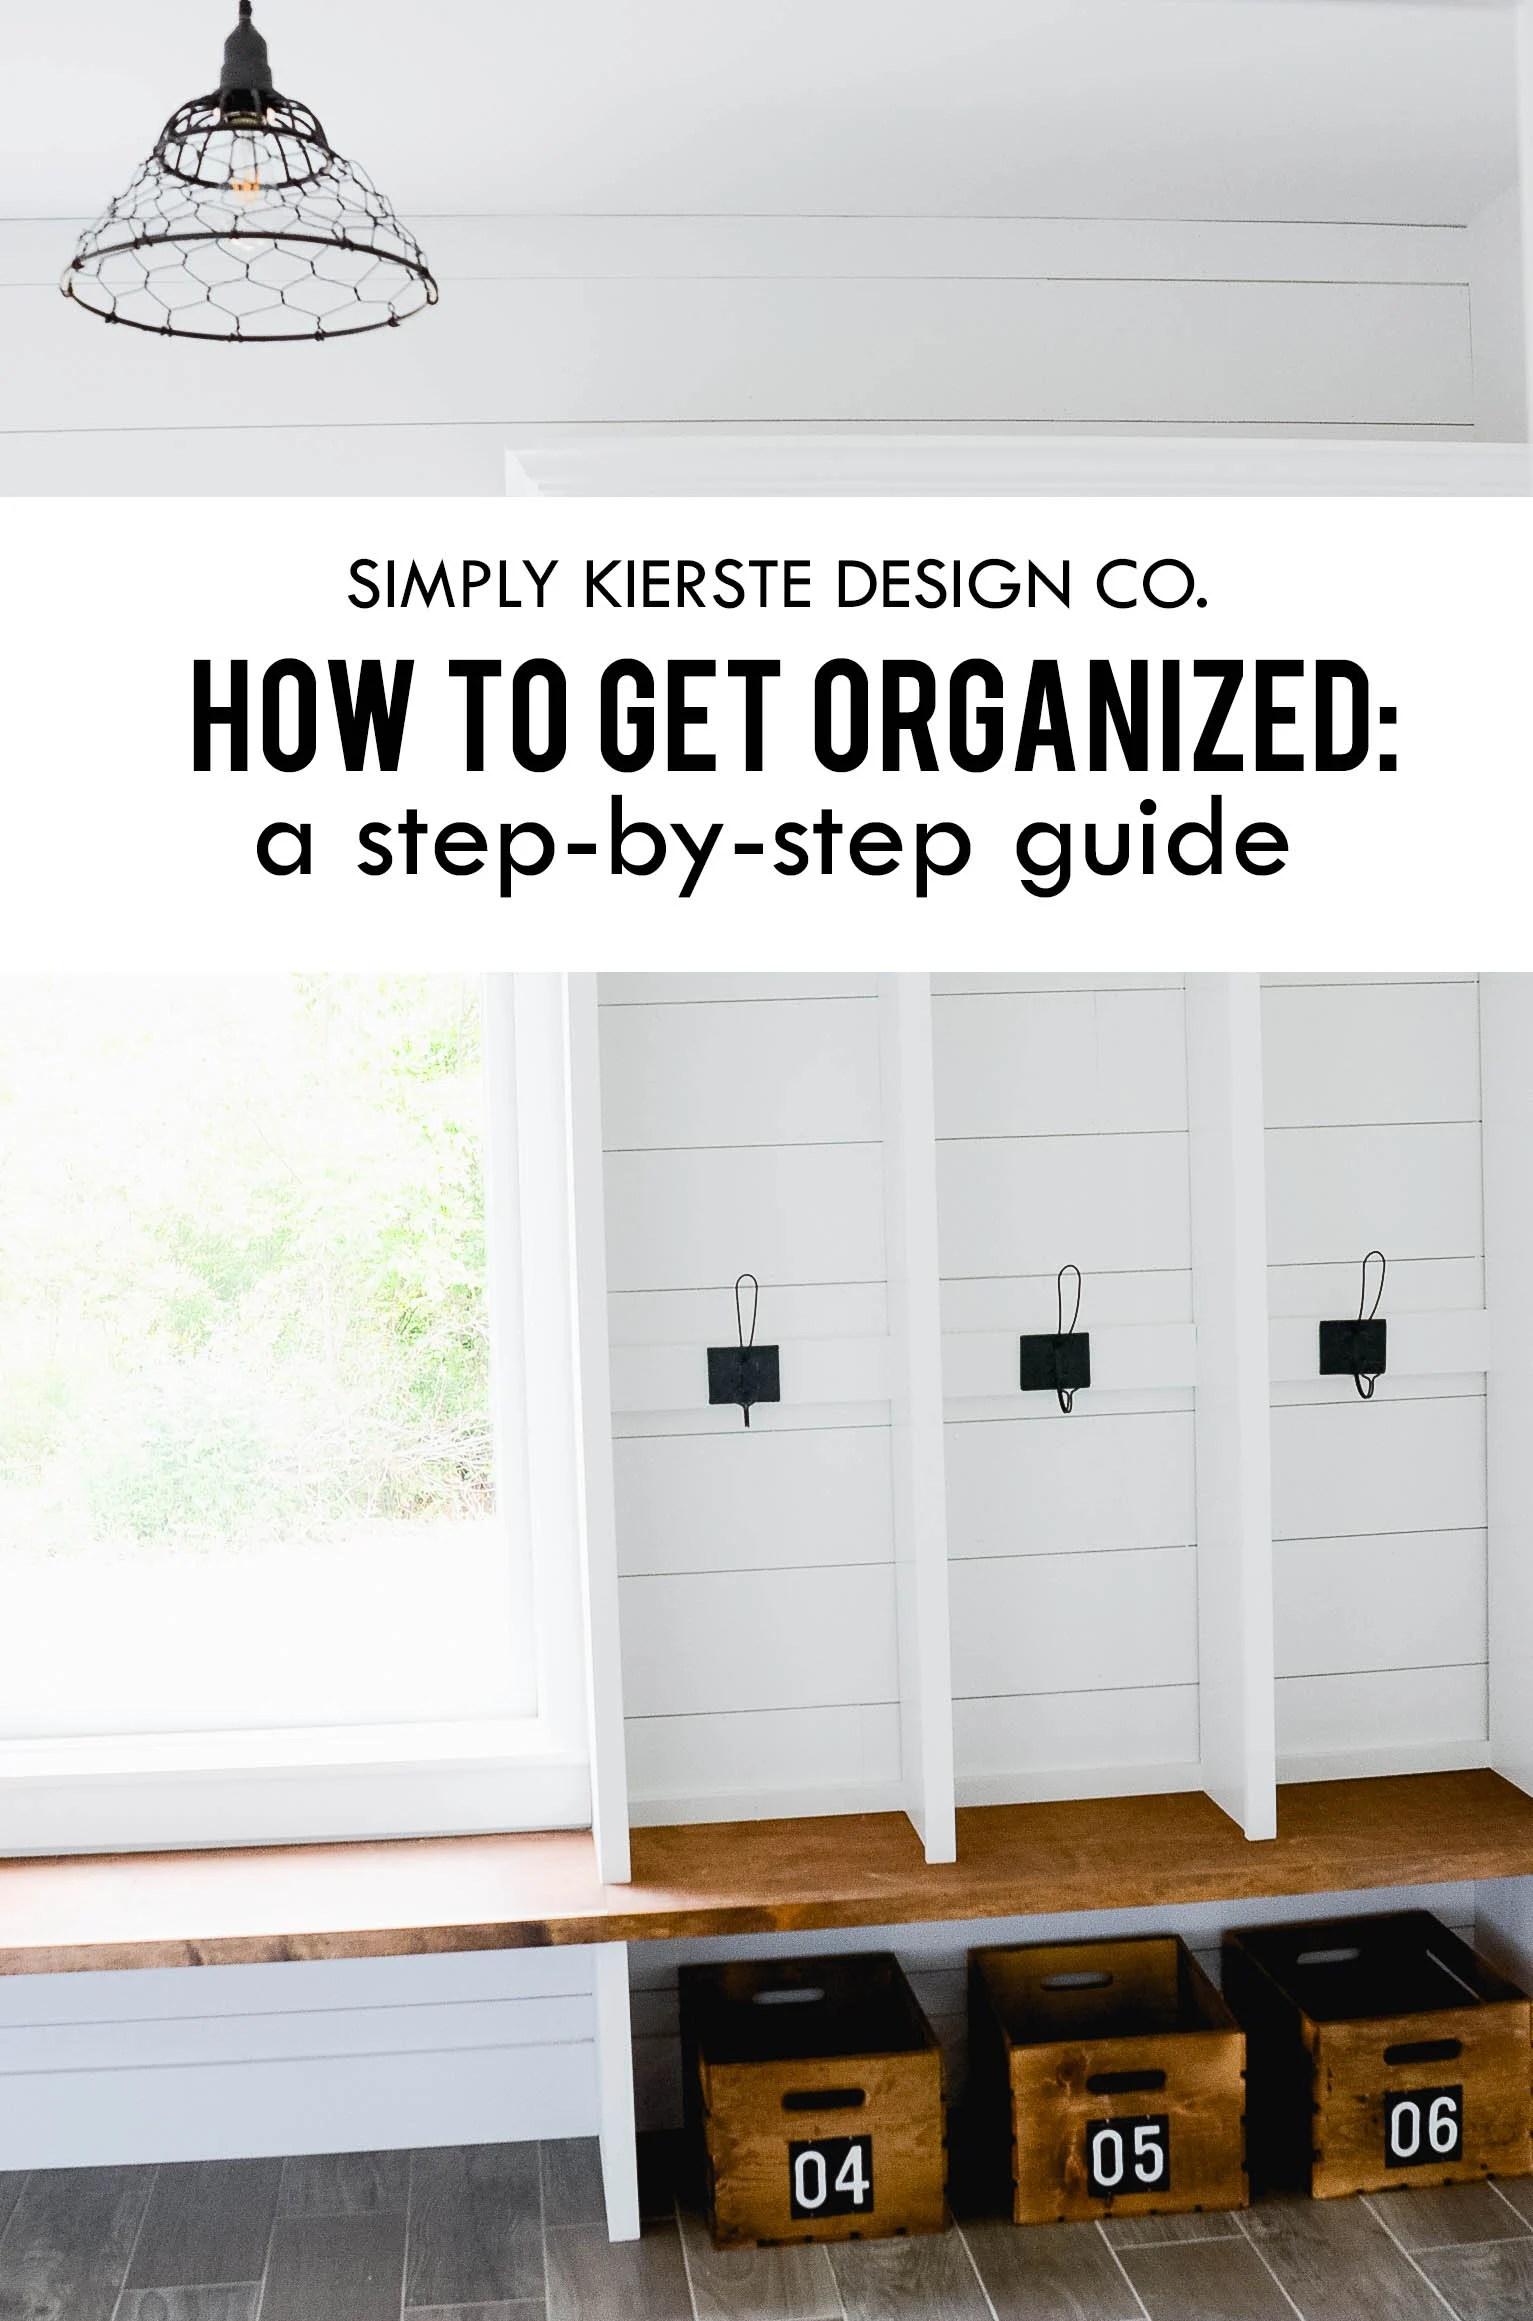 How to get organized | A guide to getting started | oldsaltfarm.com #gettingorganized #howtogetorganized #organizationtips #organizationideas